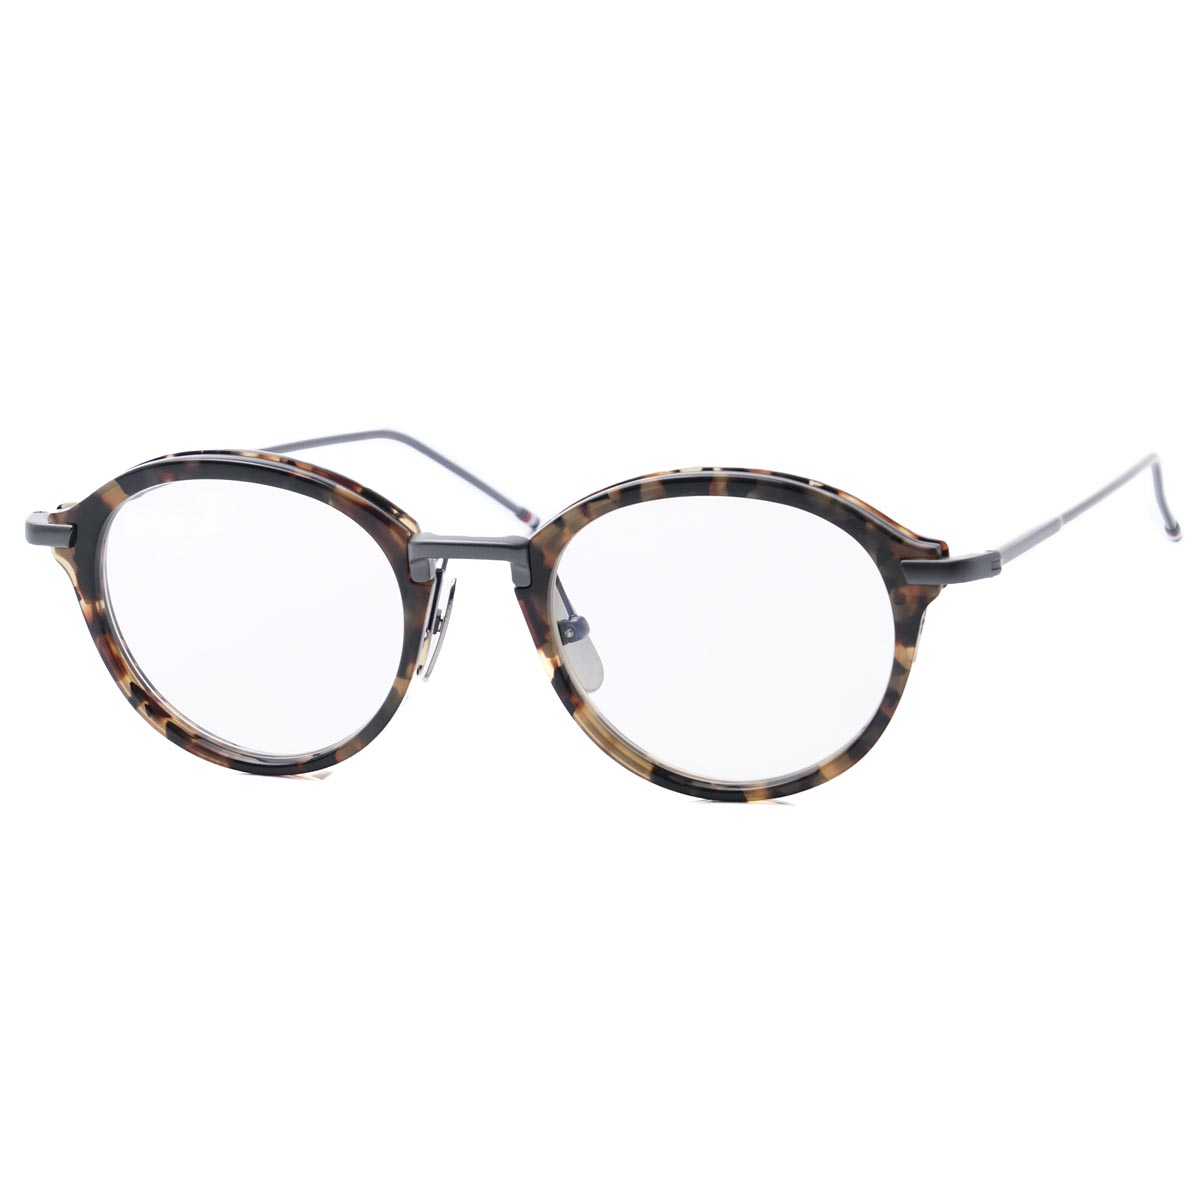 87f56a45ce0 メガネ  ラッピング無料  プレゼント tb 807 c wlt gld 45  dl   返品送料無料  眼鏡 ボストン メンズ brand ギフト   170906  ブラウン THOM BROWNE.